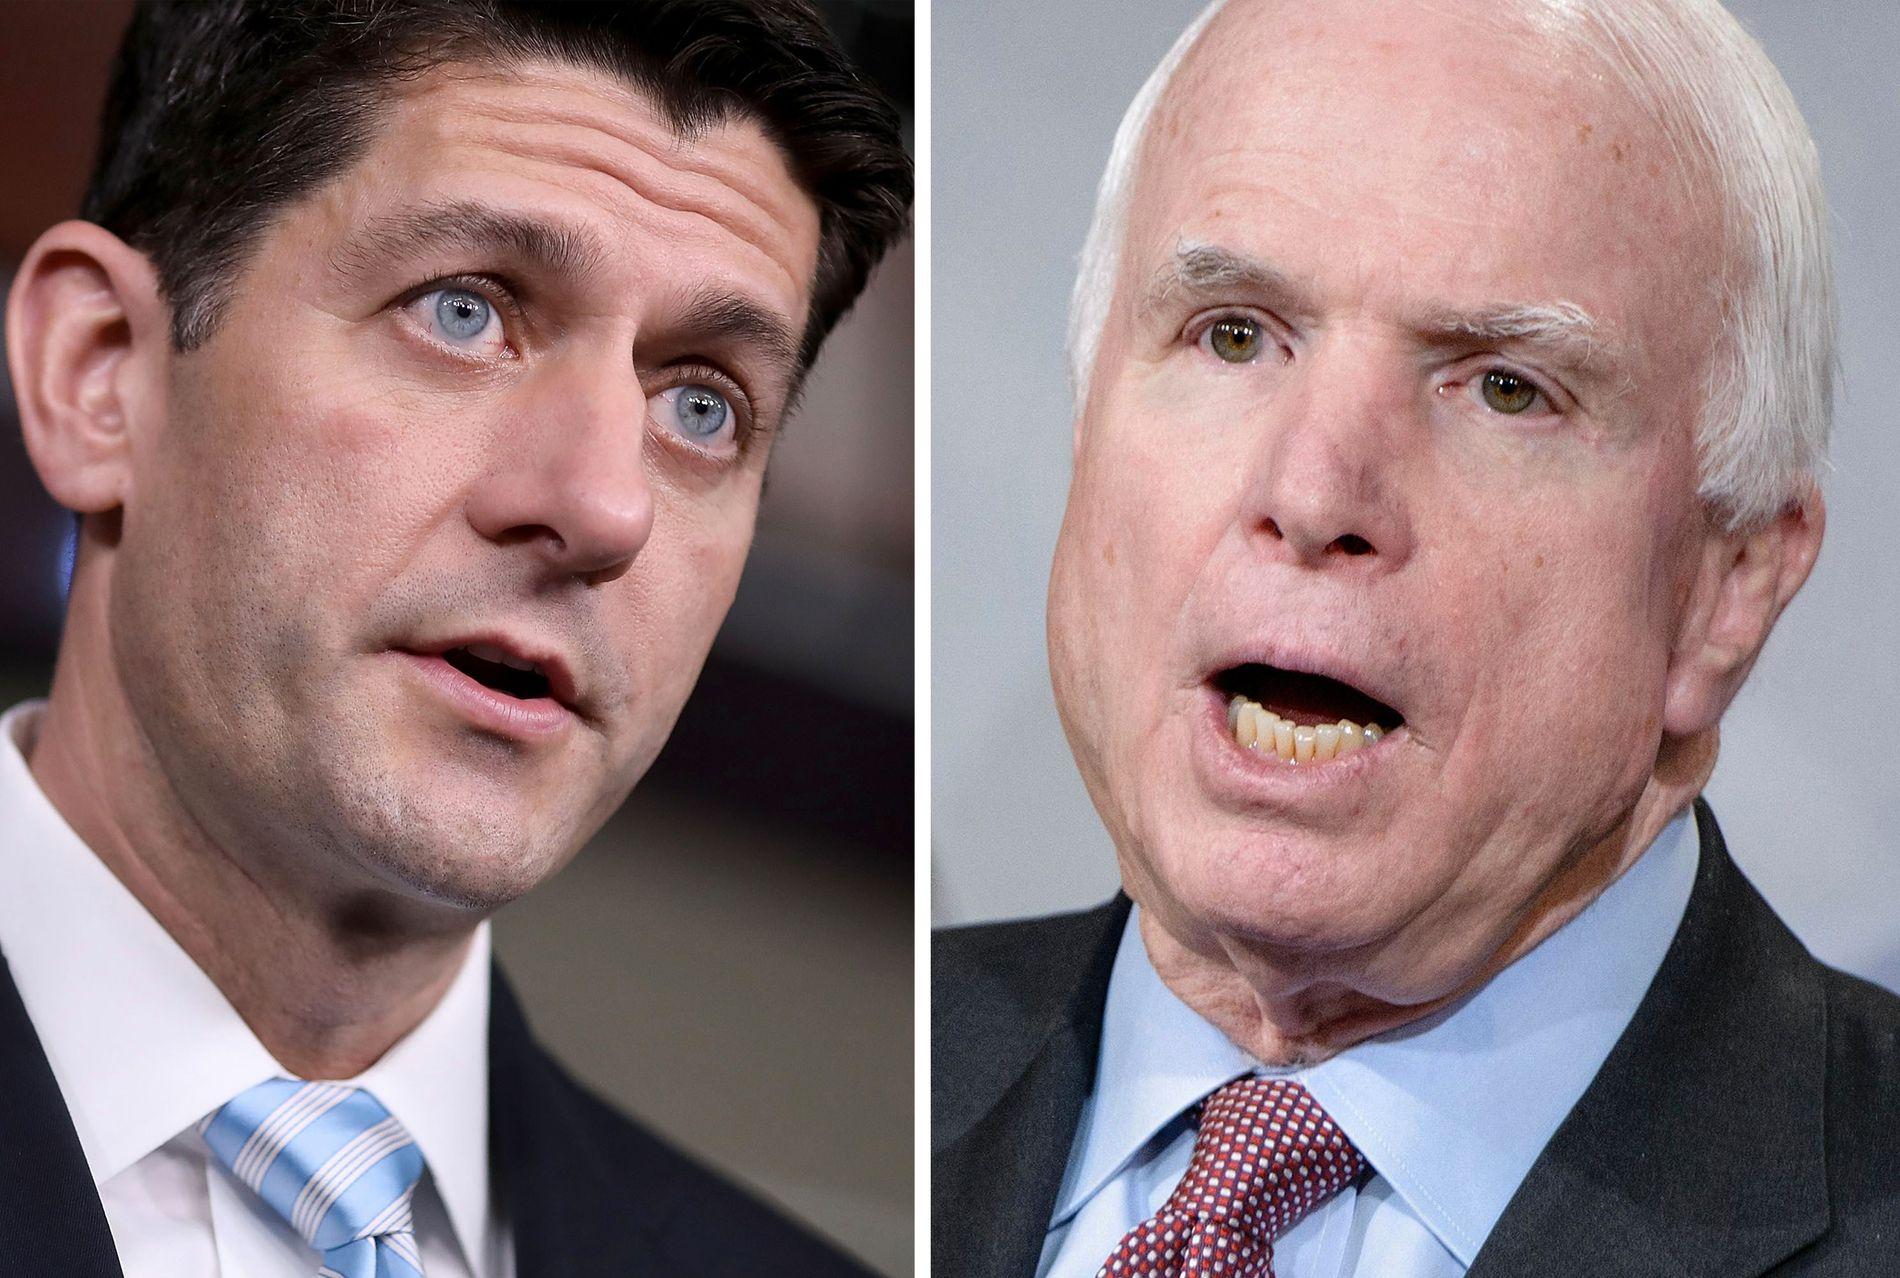 MISFORNØYDE: Leder i Representantenes hus, Paul Ryan, og Arizona-senator John McCain.